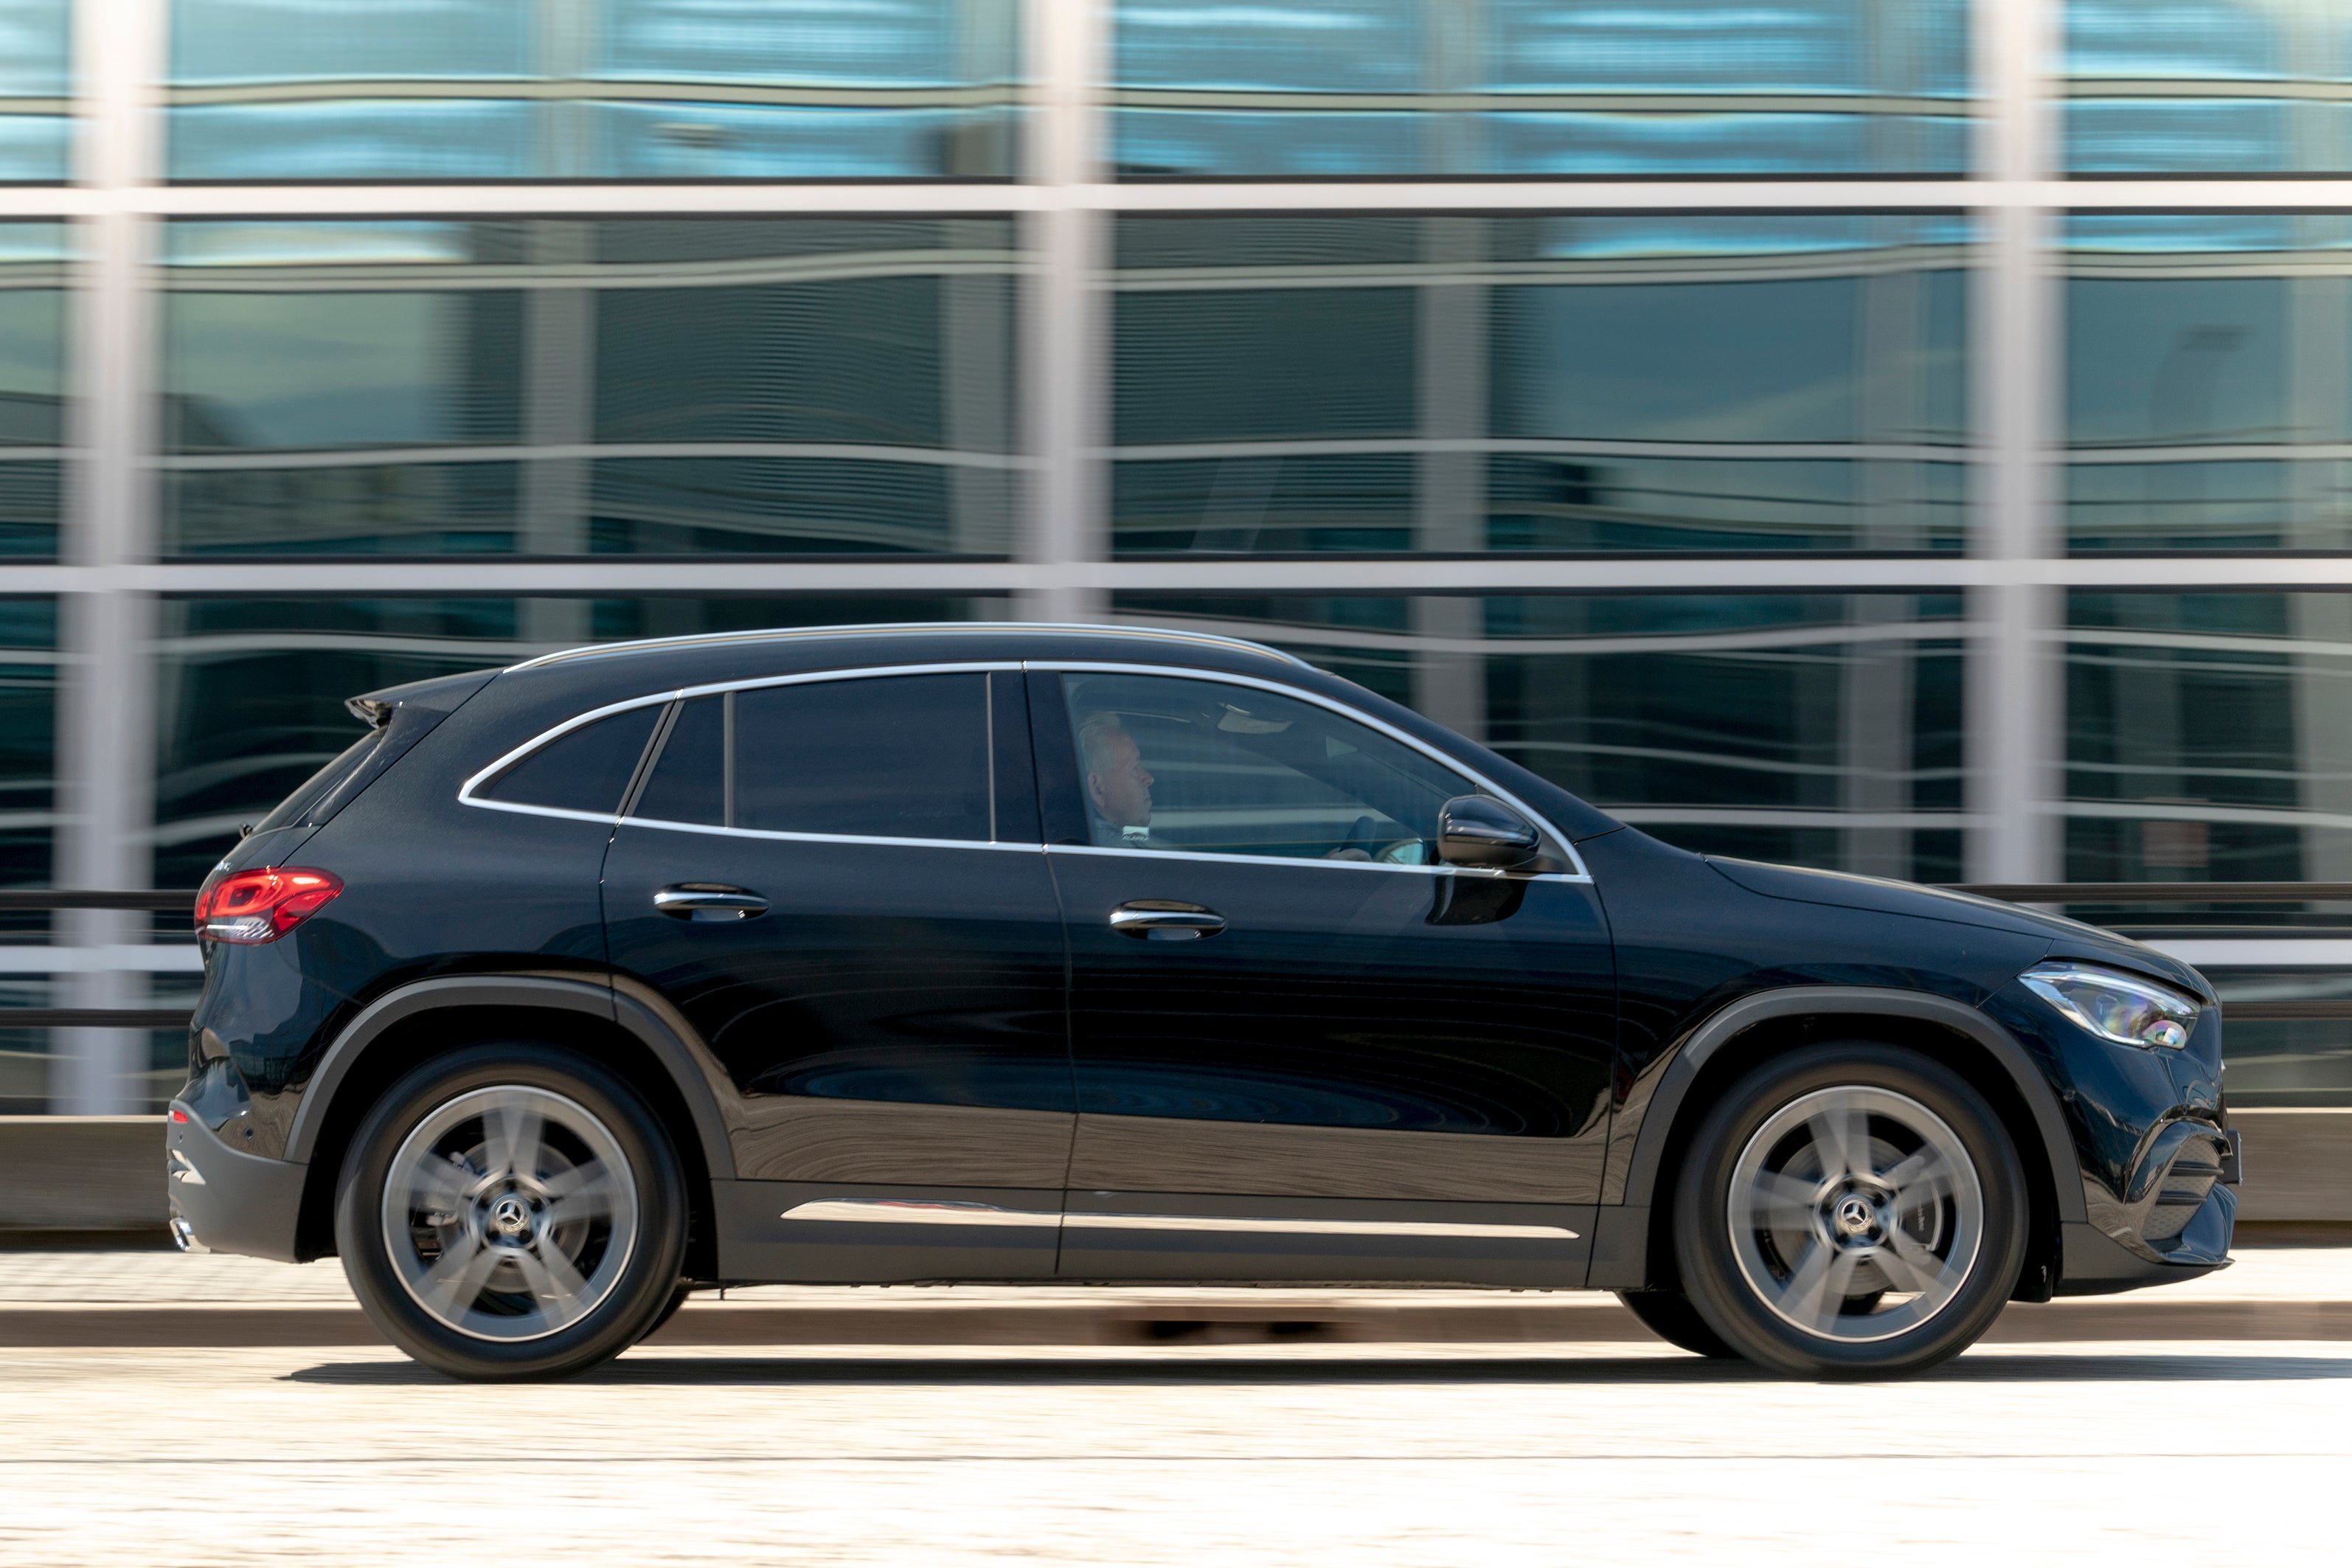 Mercedes GLA 2020 rightside exterior